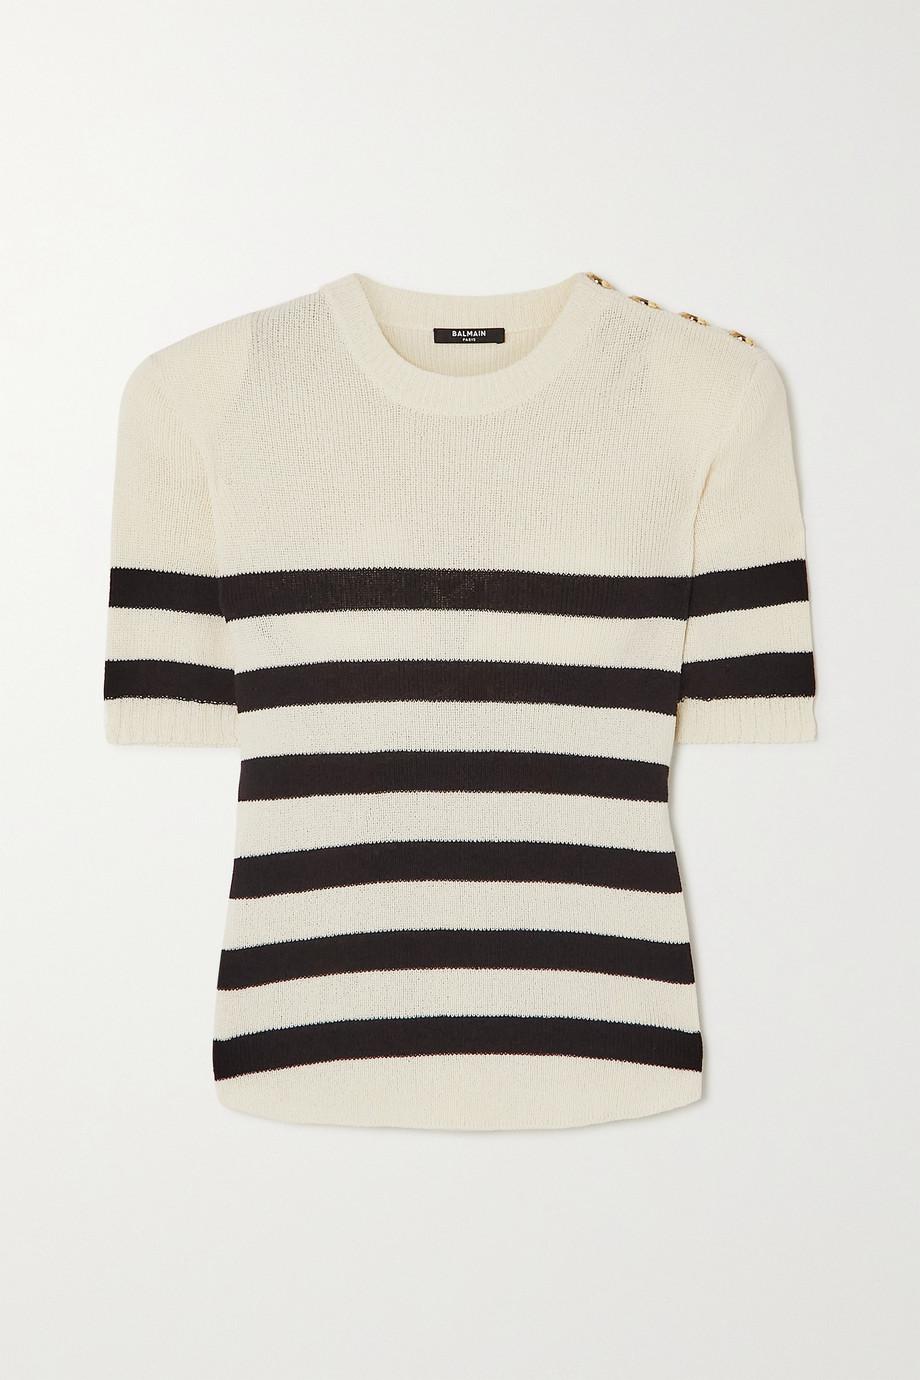 Balmain Button-embellished striped cotton-blend T-shirt